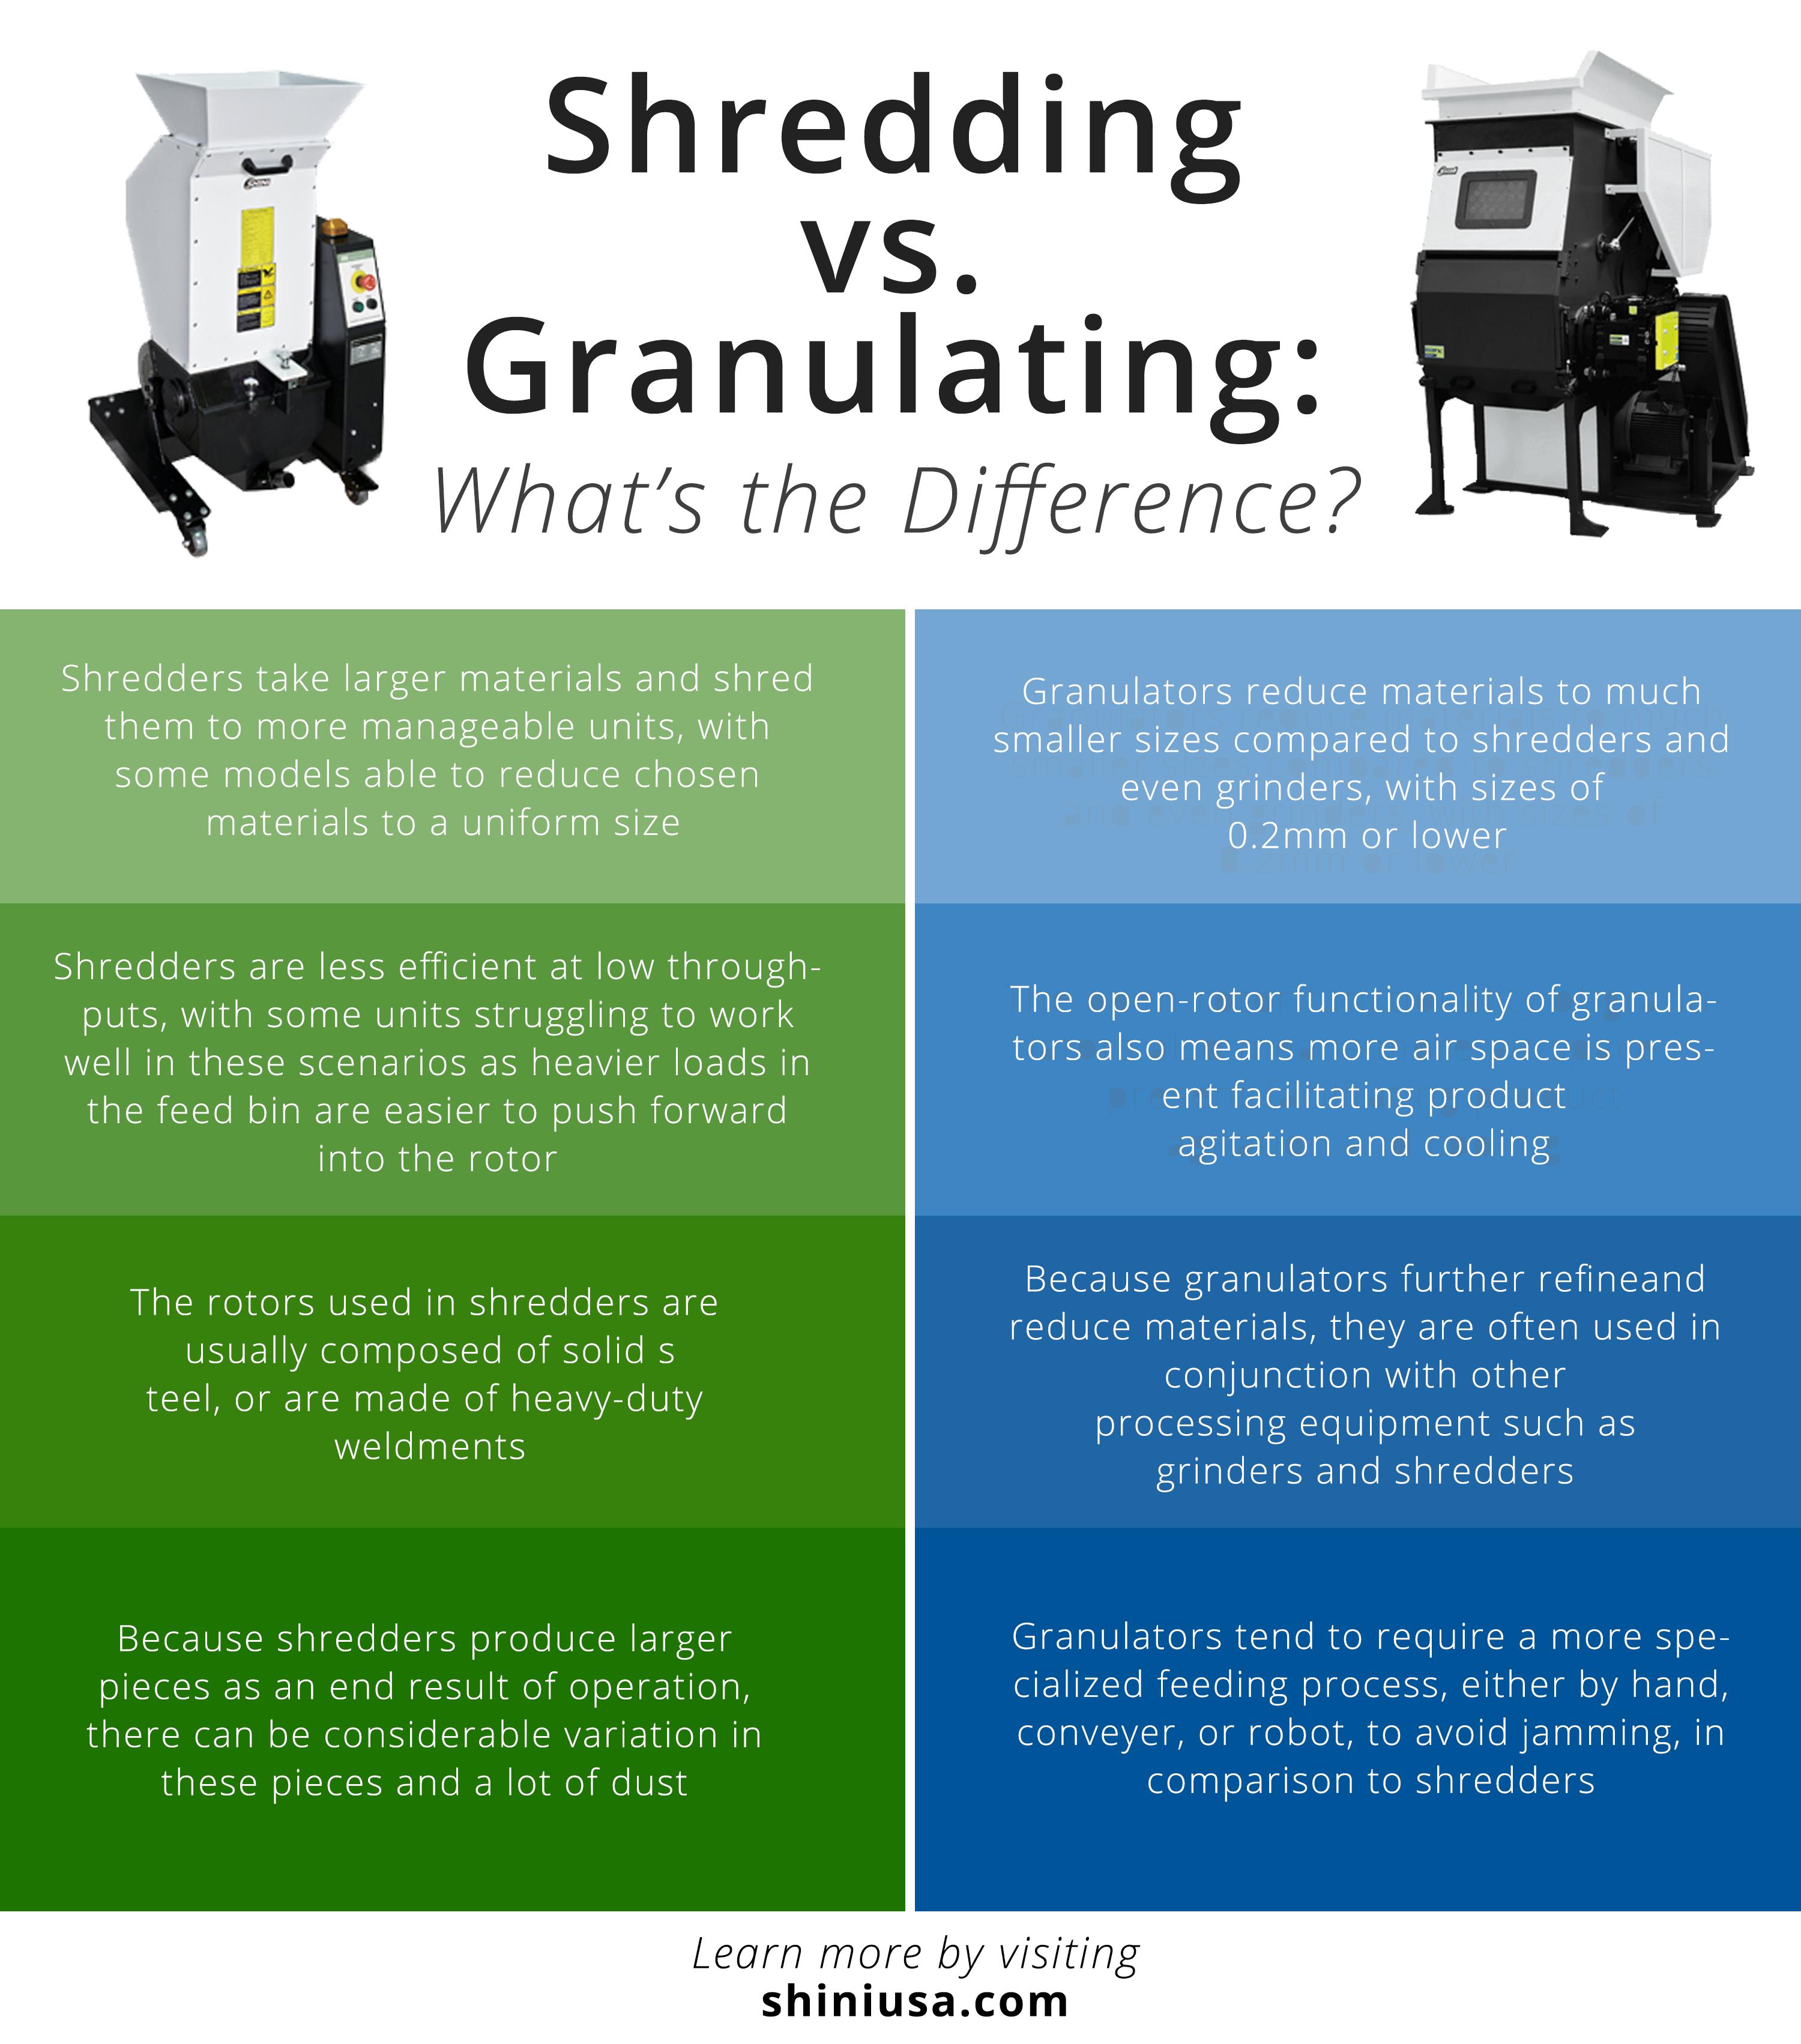 shredding vs granulating